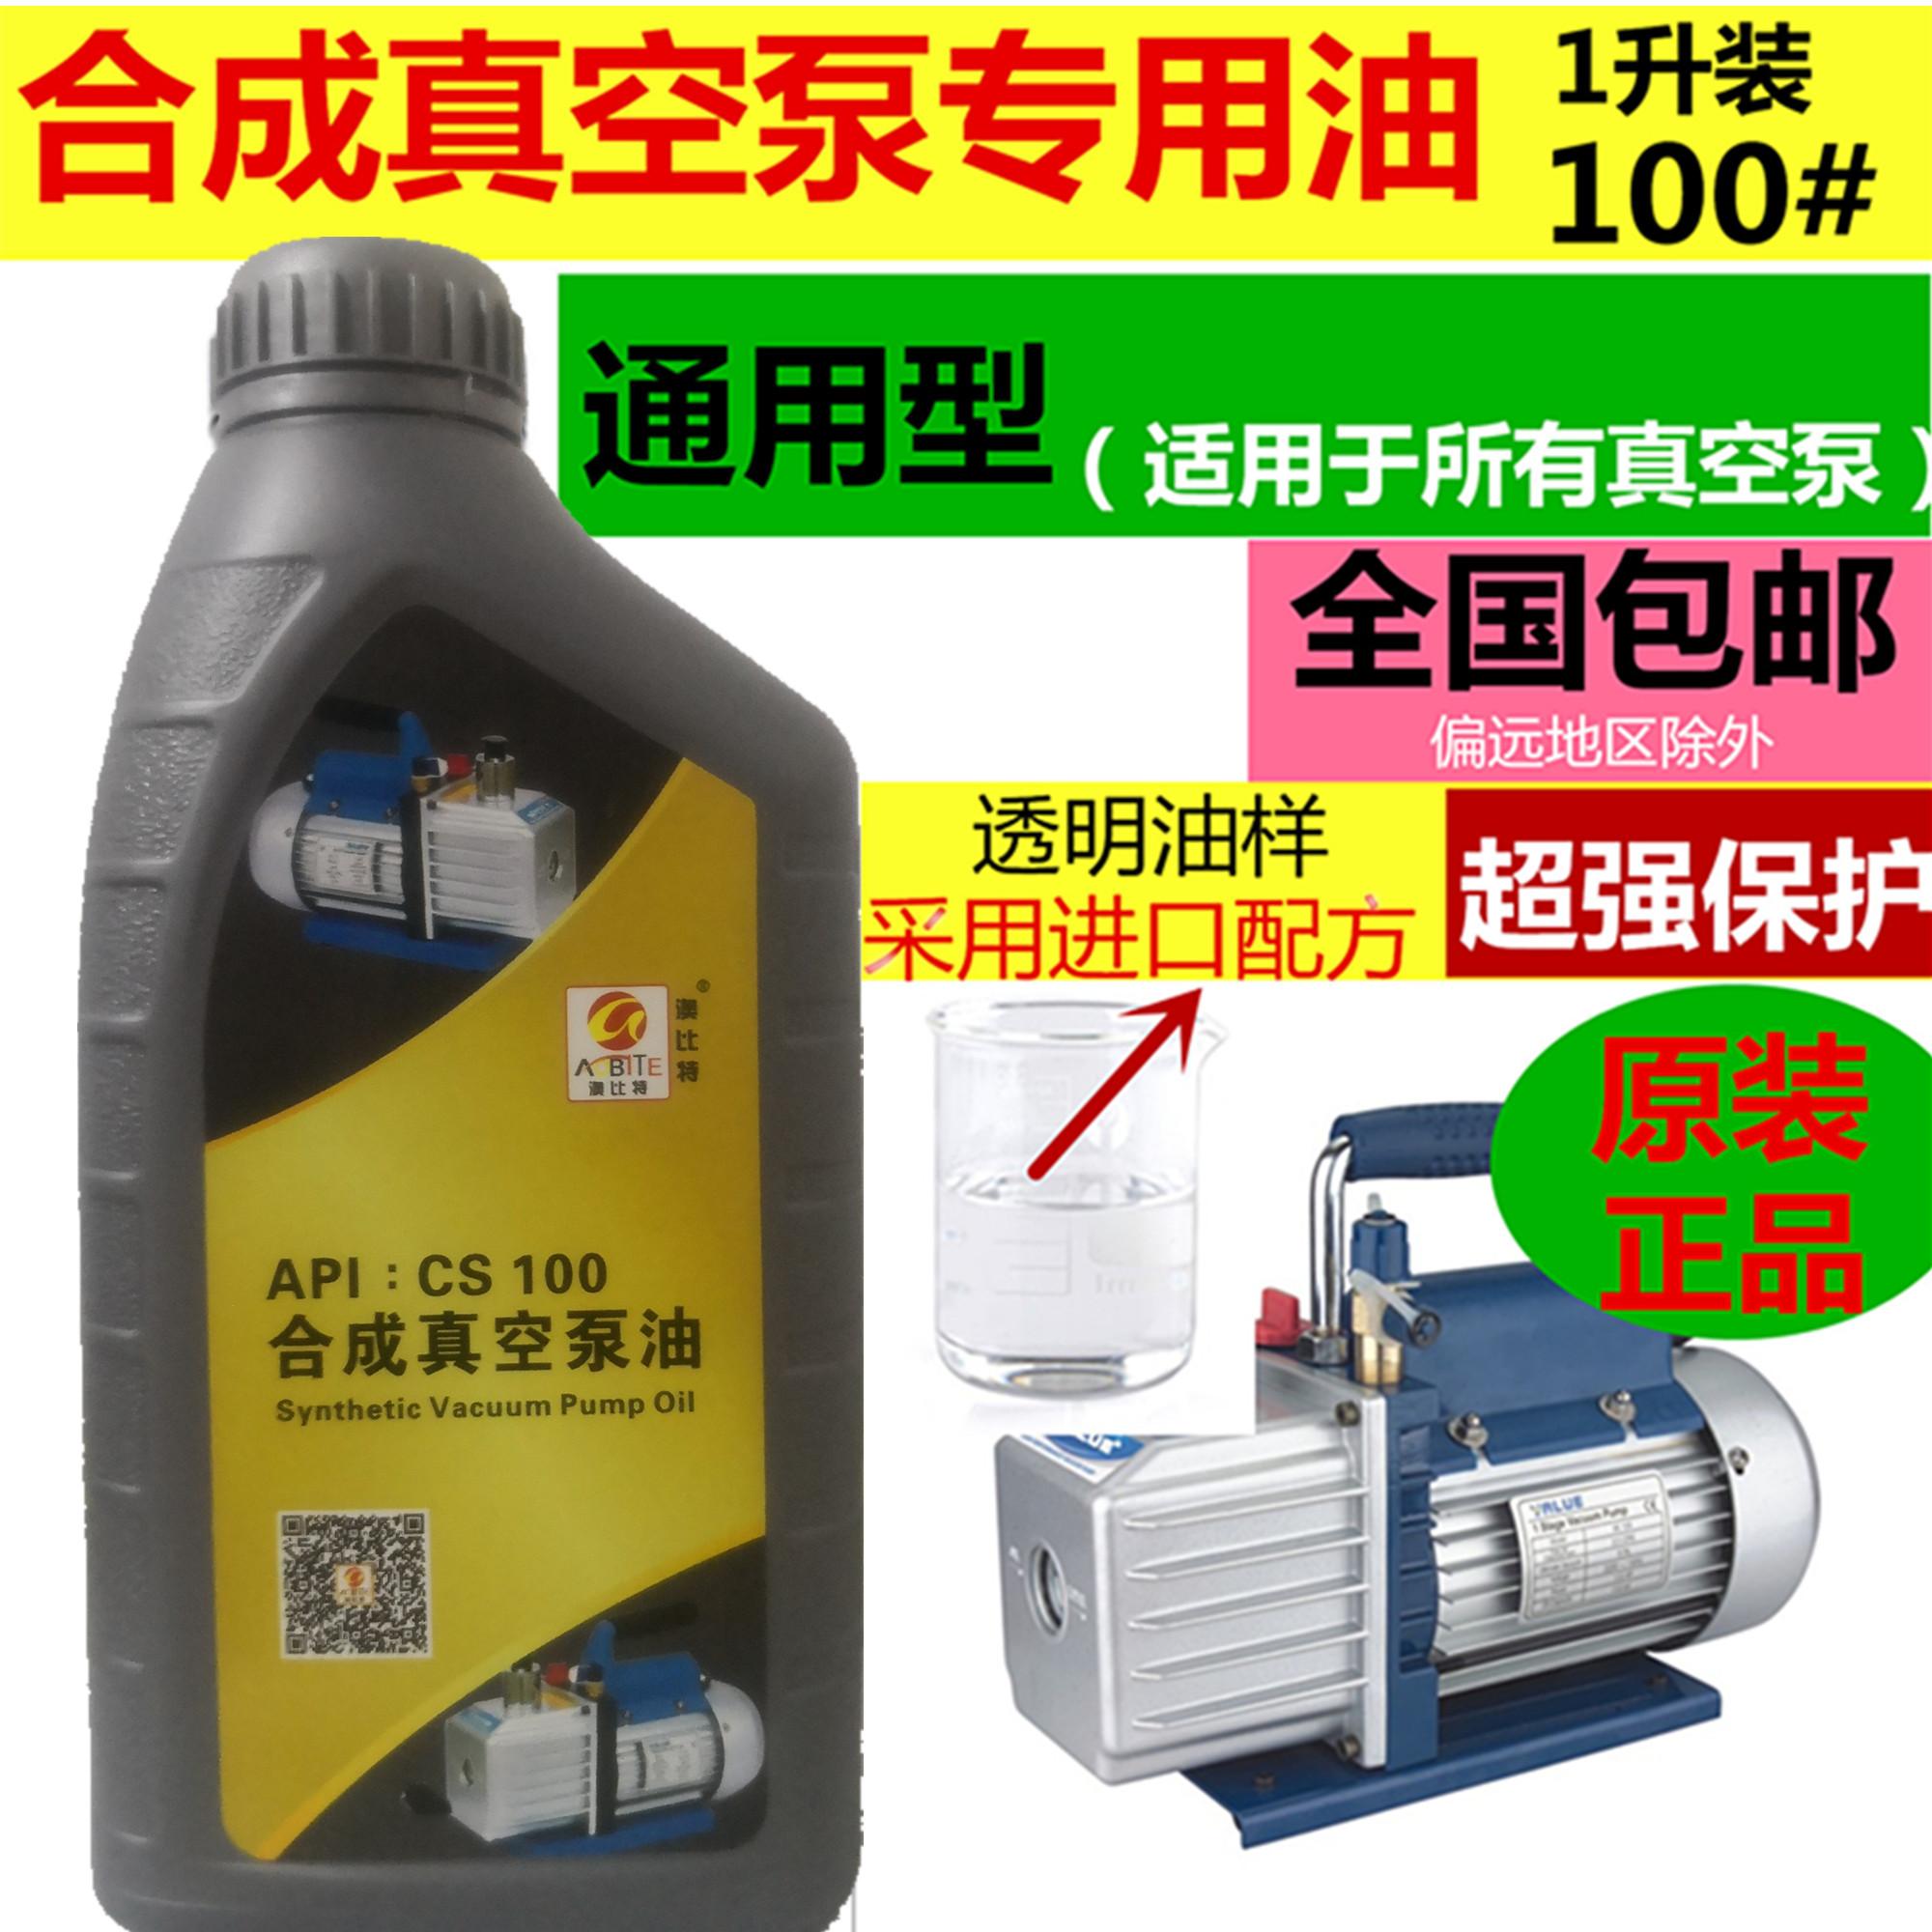 Vacuum pump oil No. 100 vacuum pump special oil rotary oil packaging machine vacuum oil